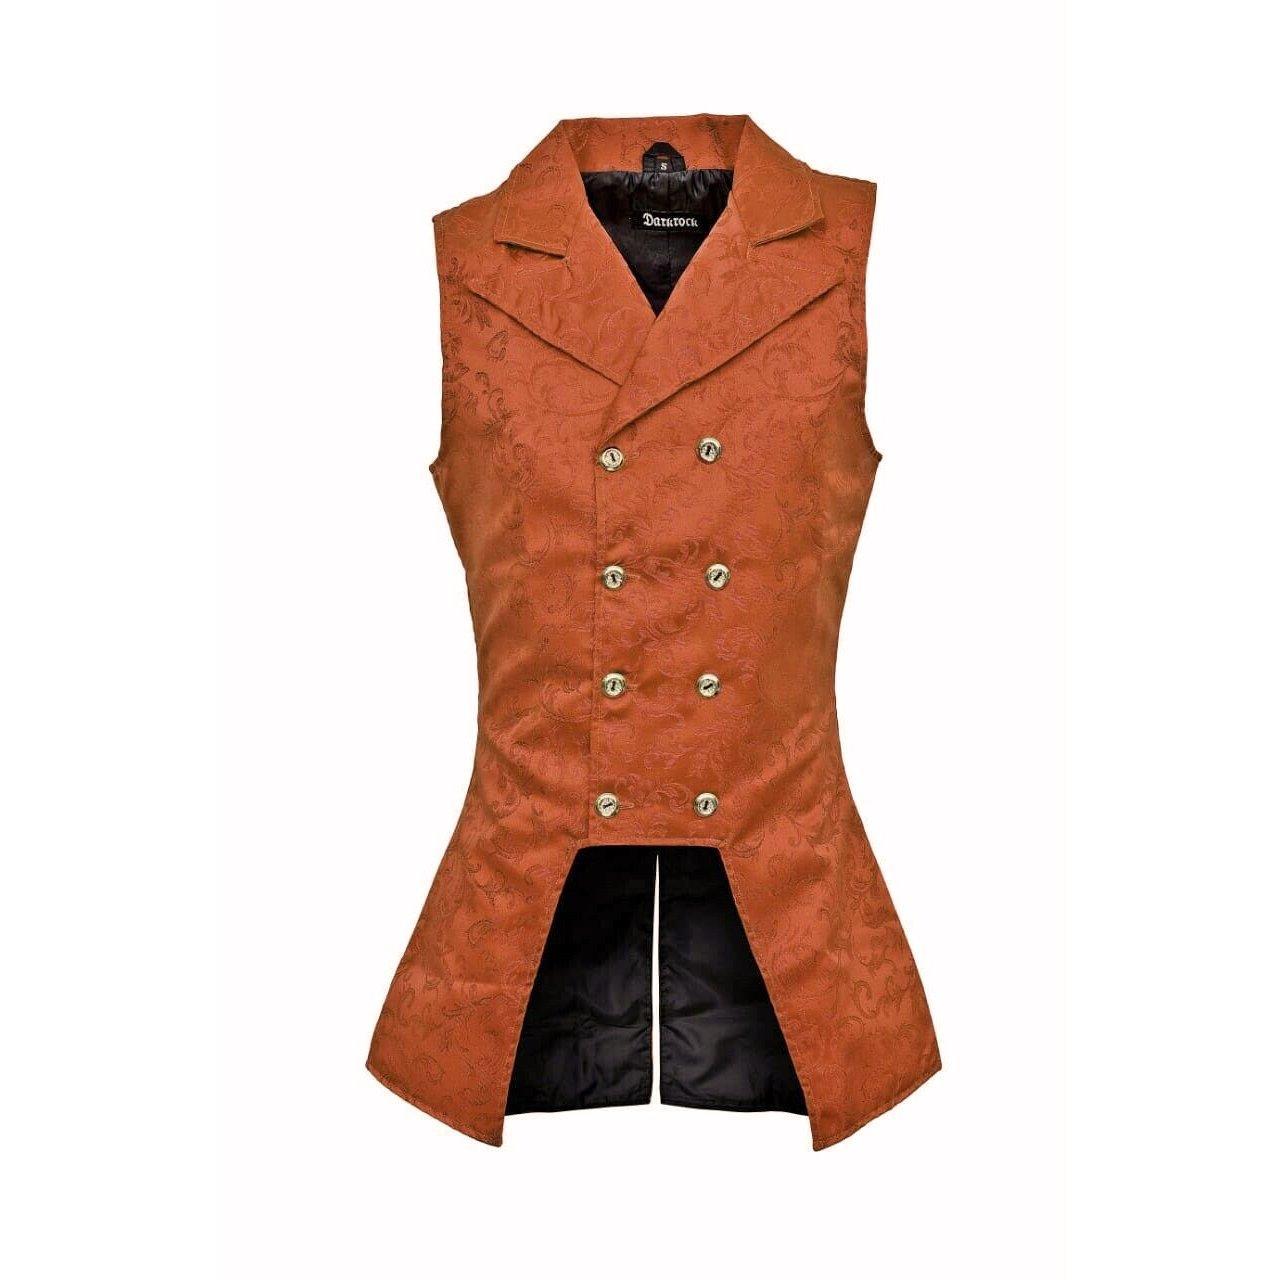 DARKROCK Brown Brocade Double Breasted GOVERNOR Vest Waistcoat (front)